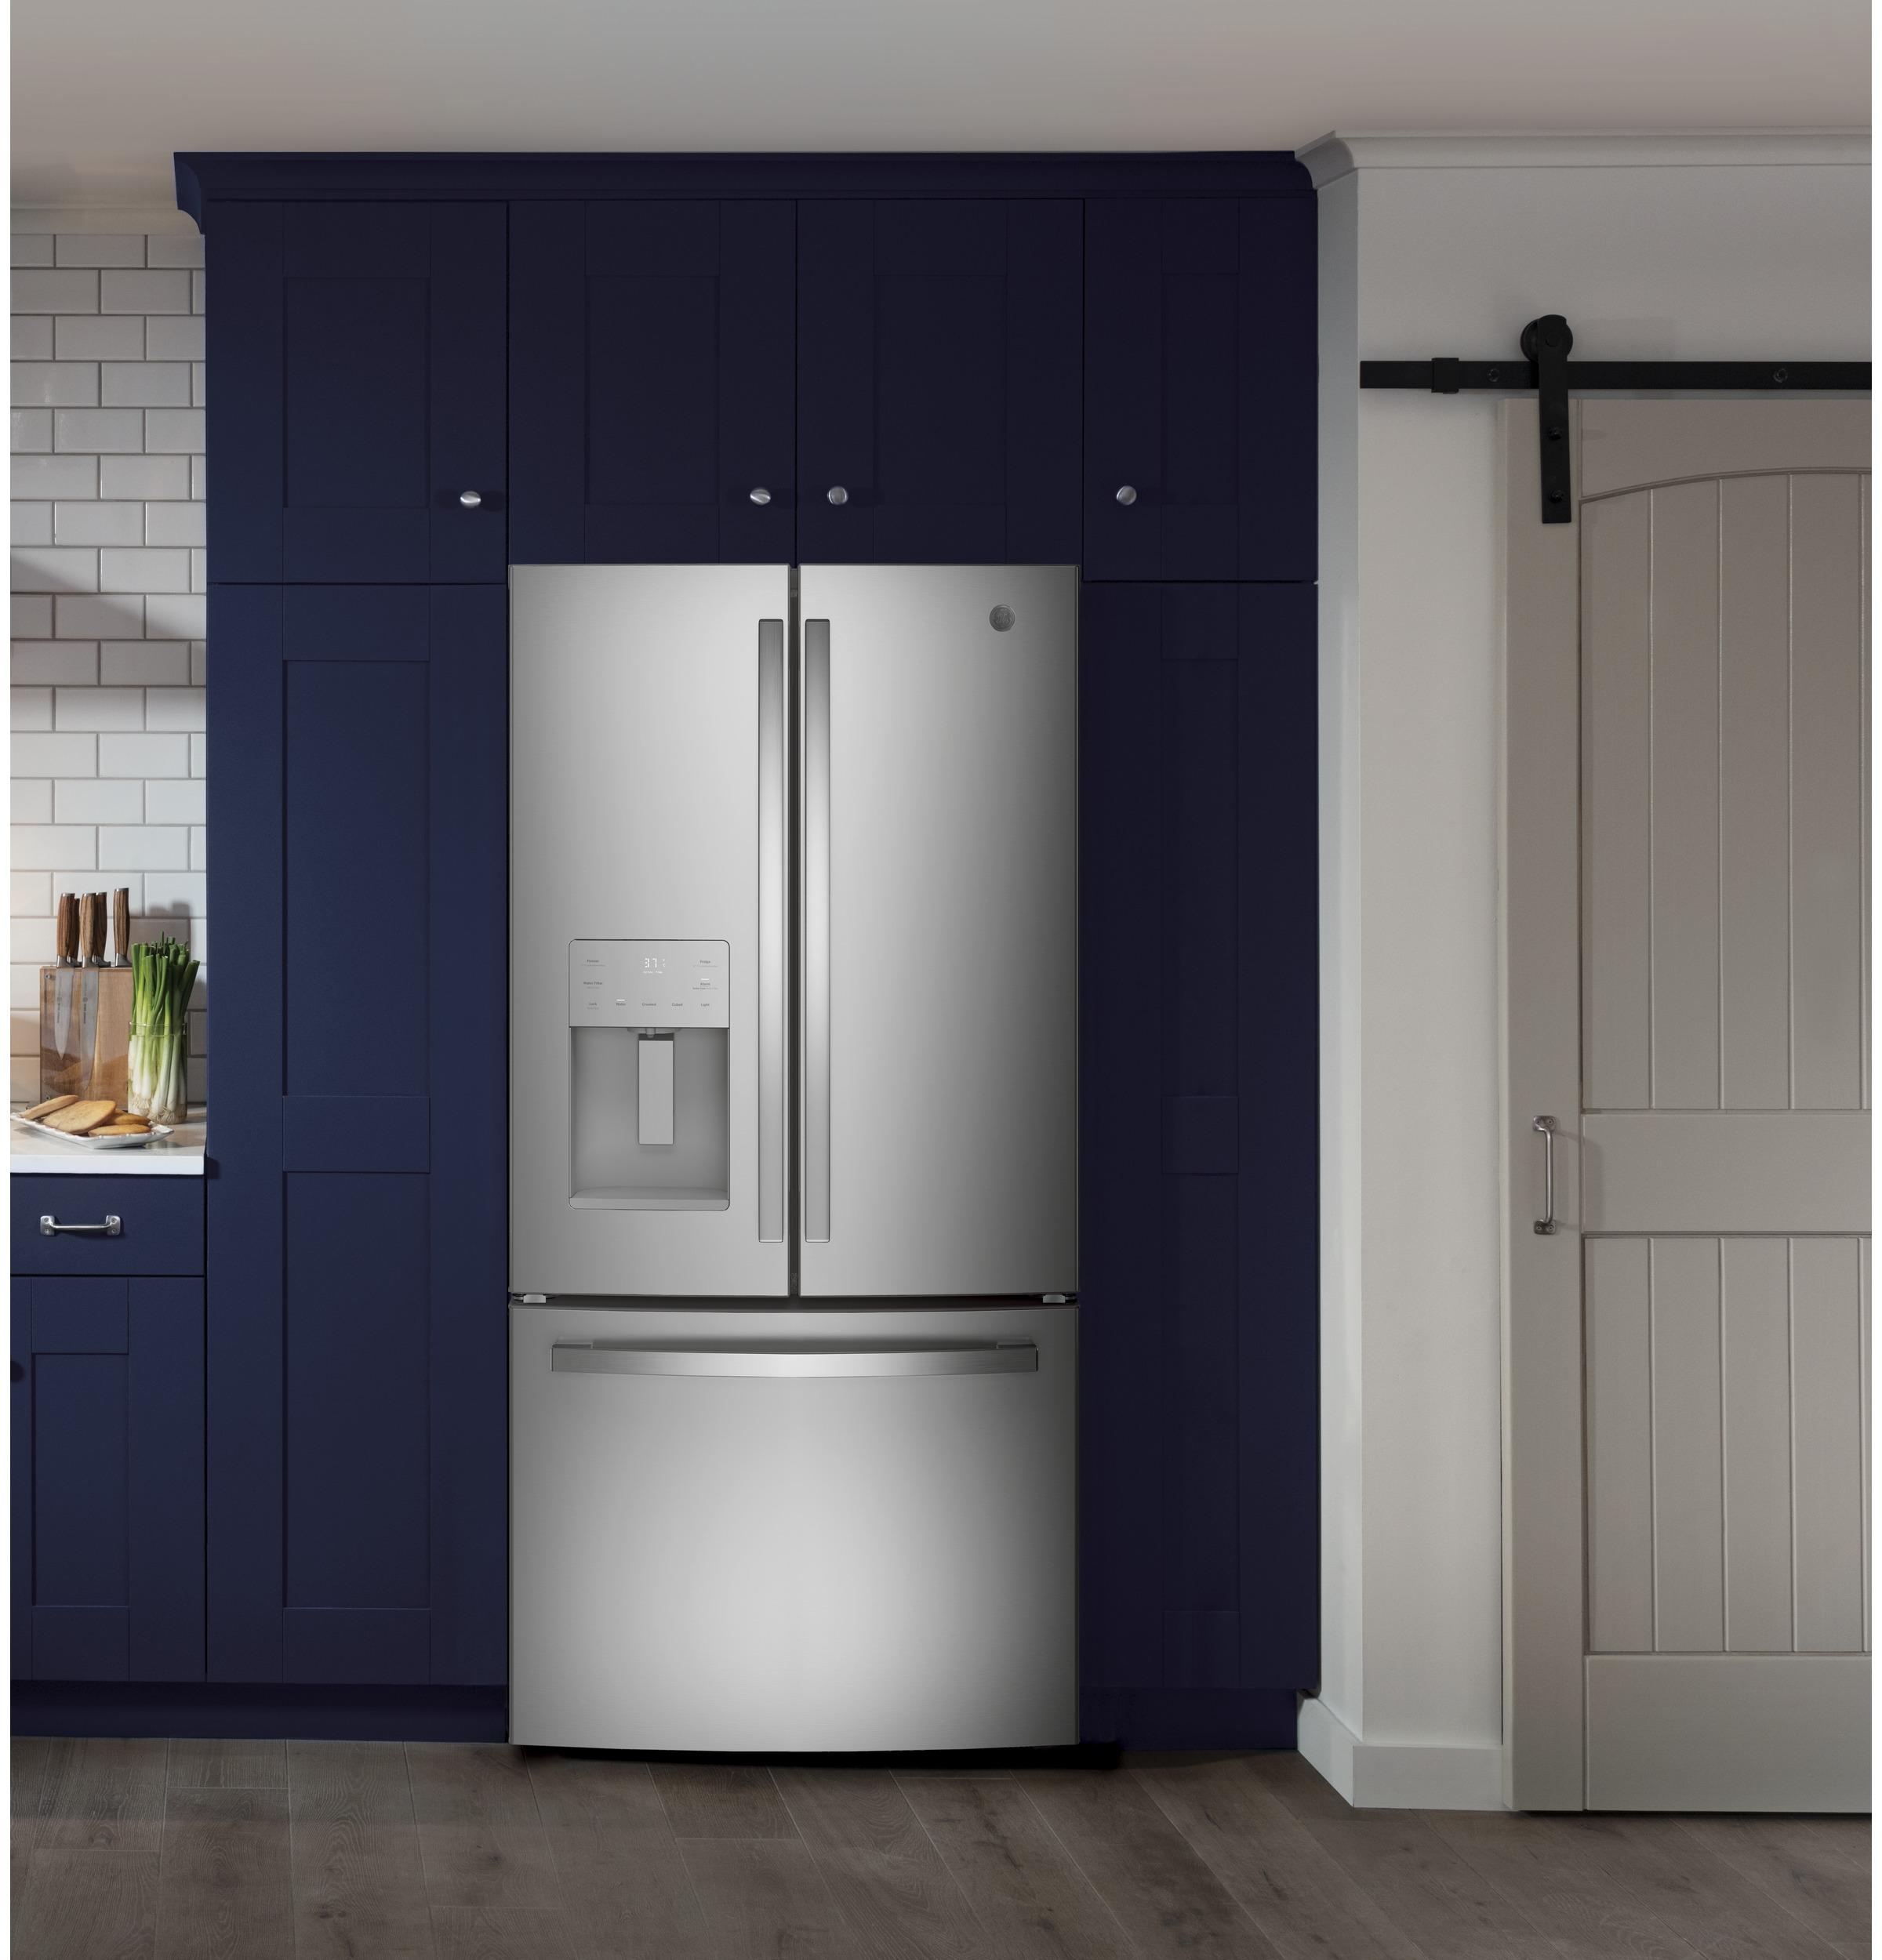 Model: GFE24JSKSS | GE GE® ENERGY STAR® 23.7 Cu. Ft. French-Door Refrigerator